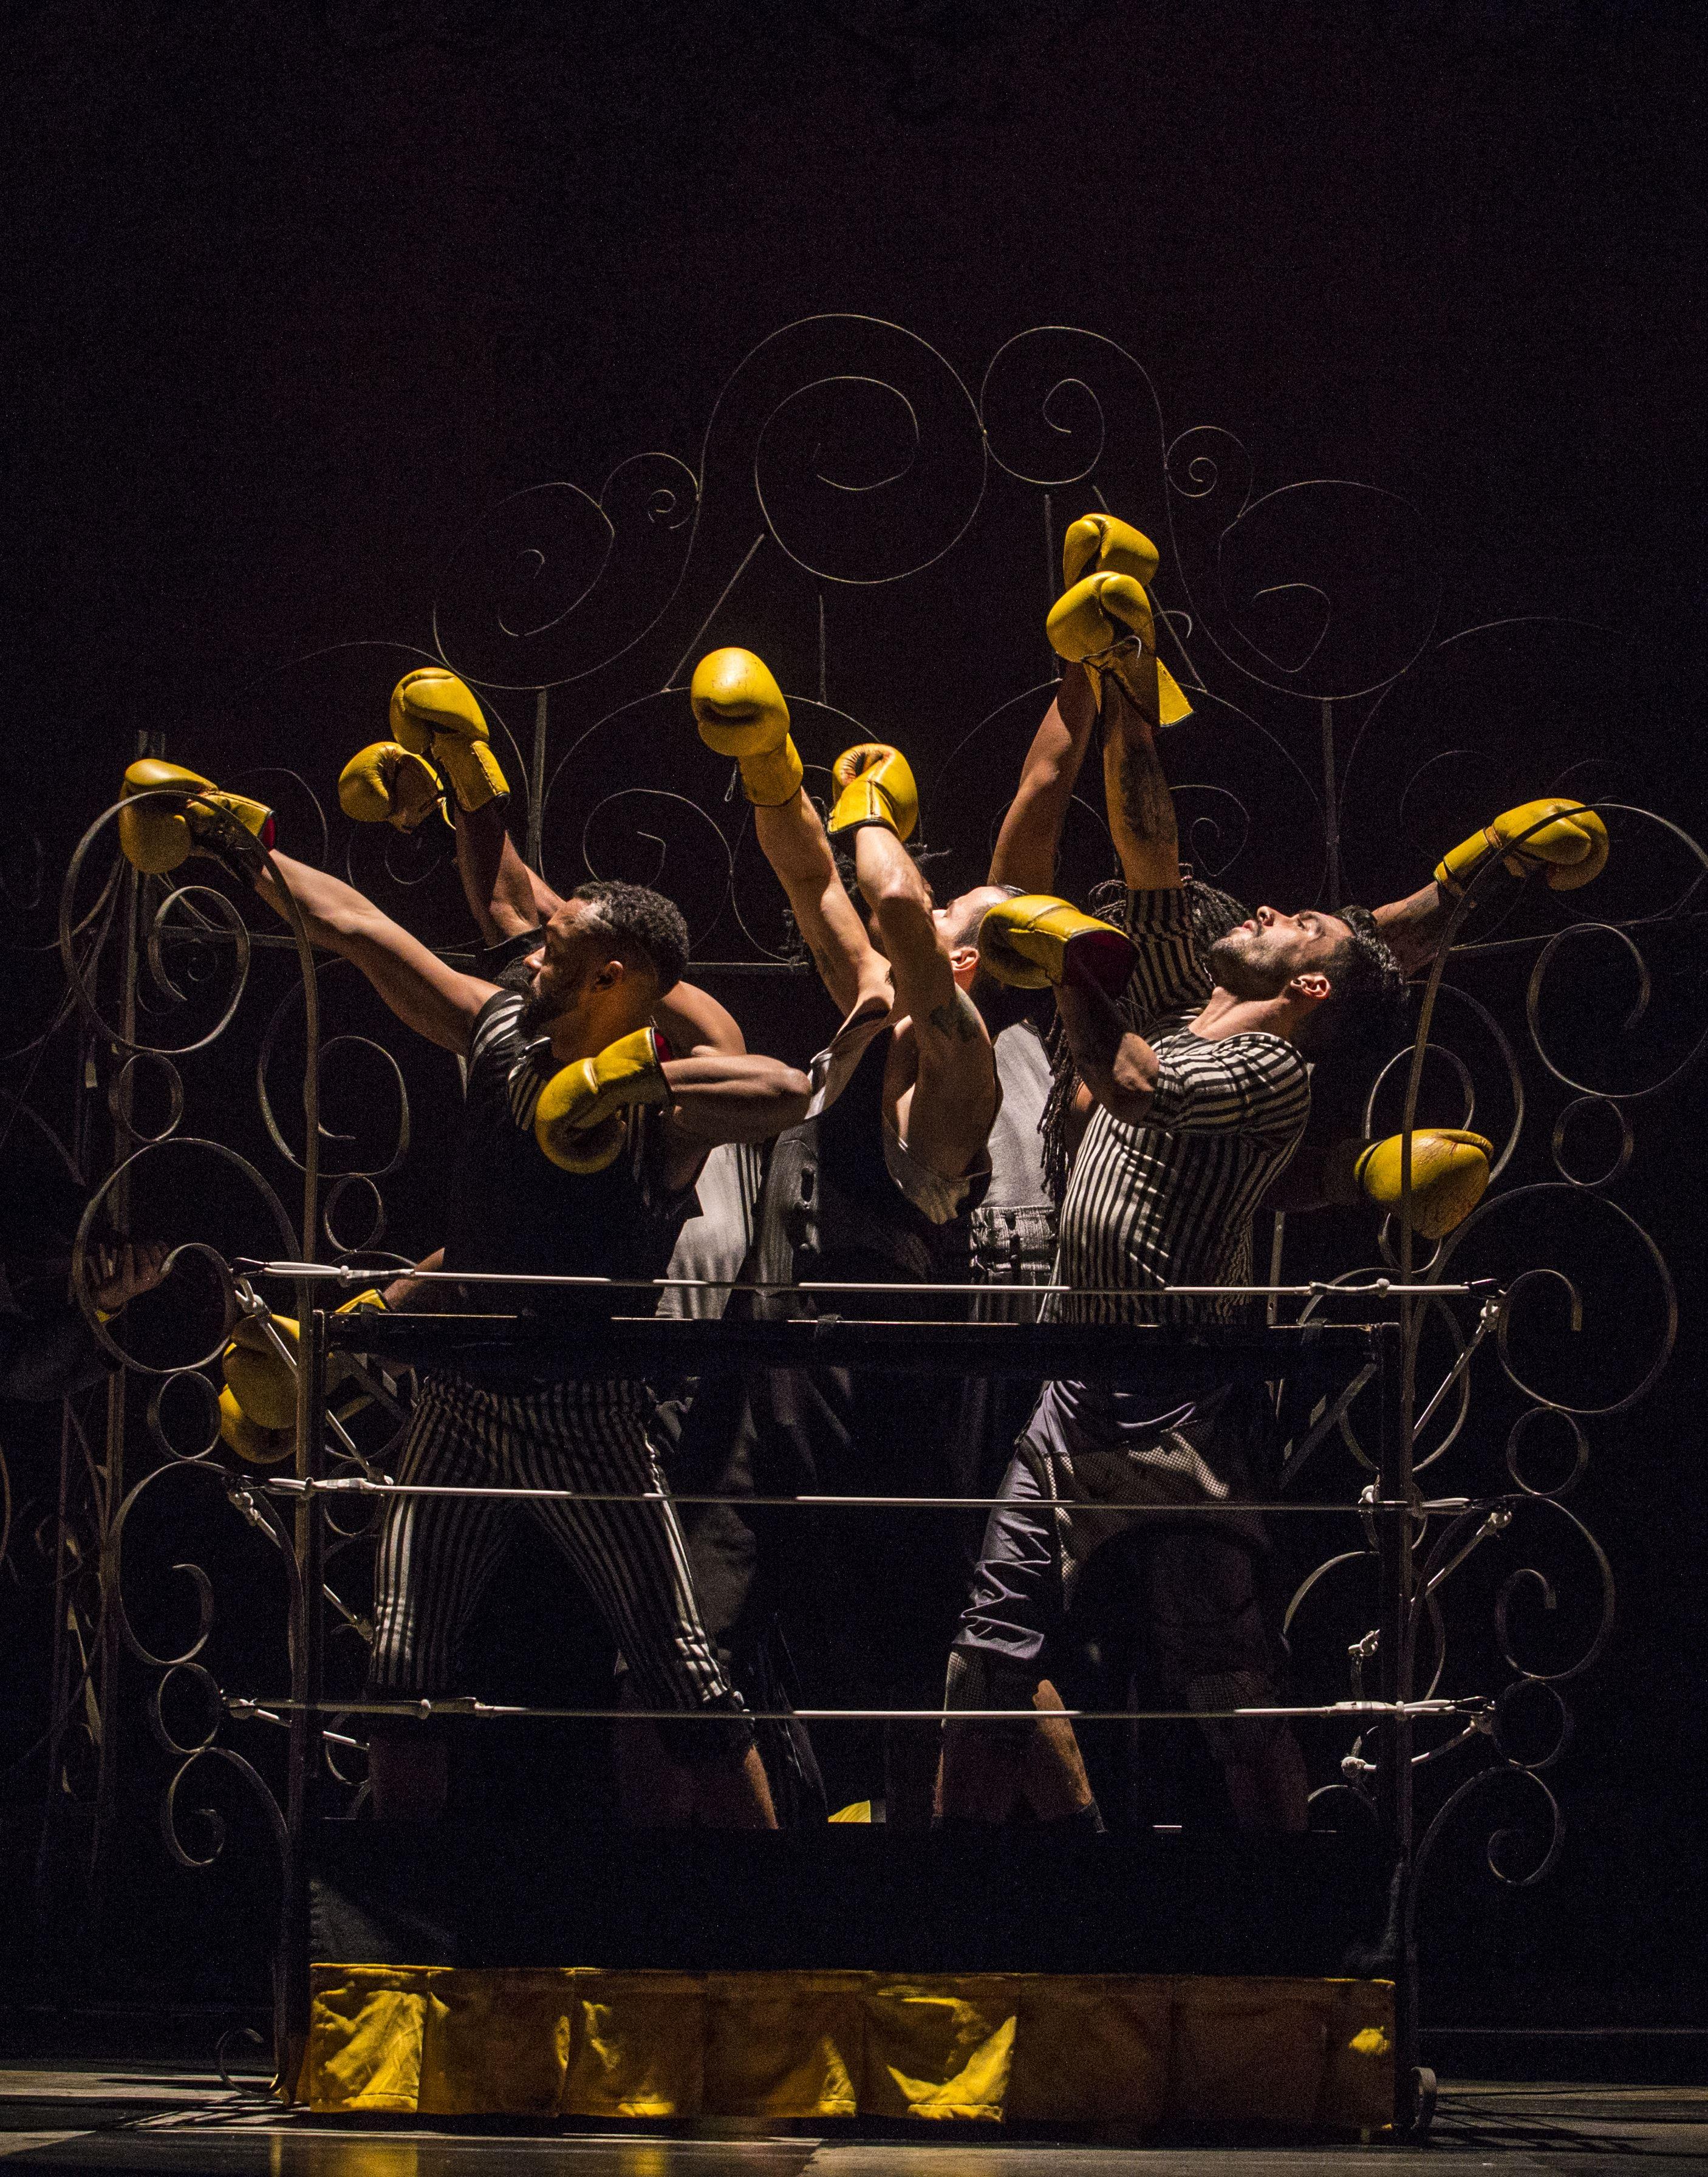 Boxe Boxe Brasil / Mourad Merzouki - Montpellier Danse